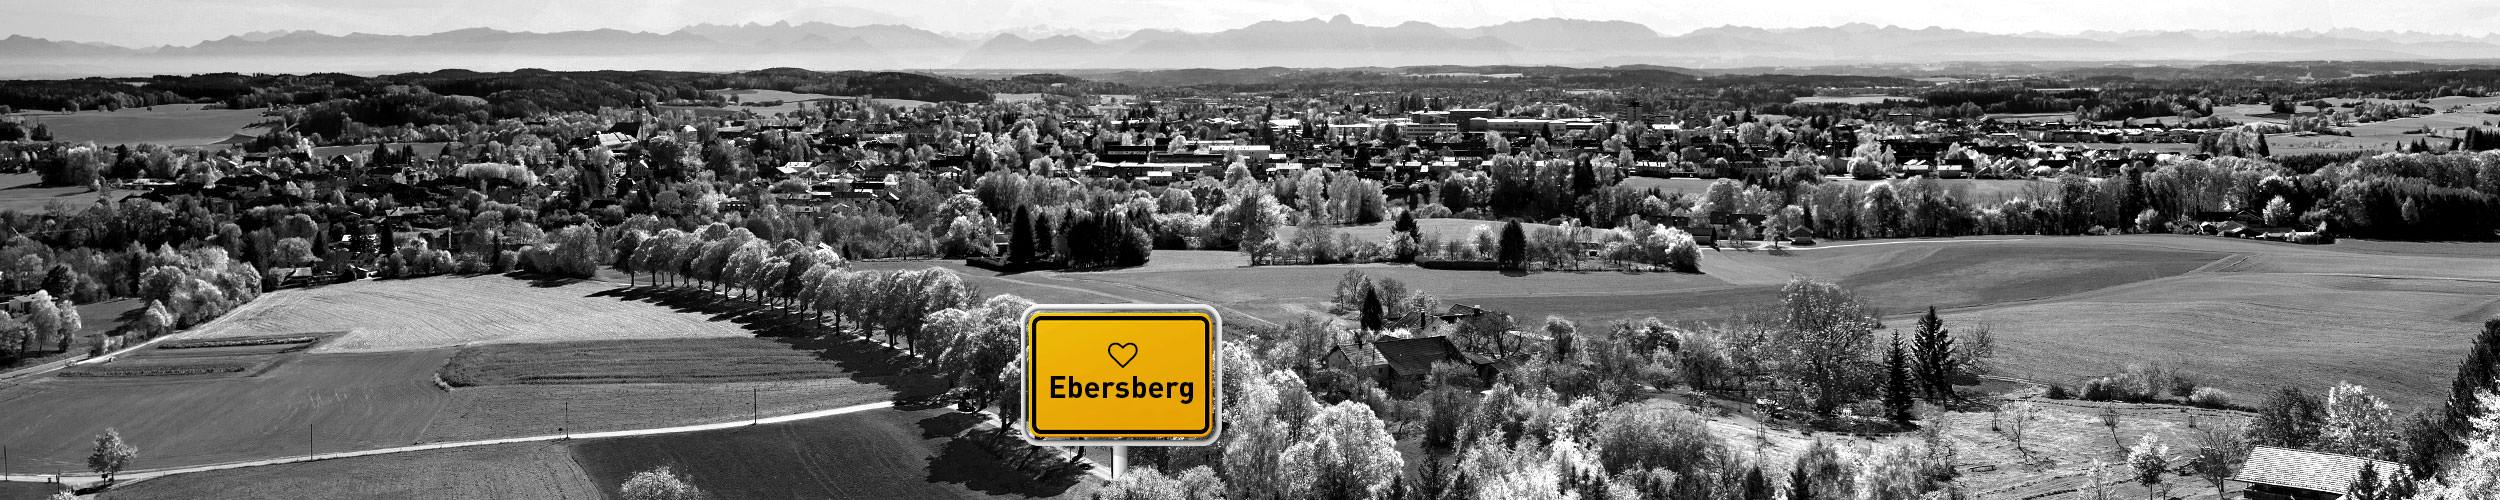 purpix - modernes Webdesign für Ebersberg